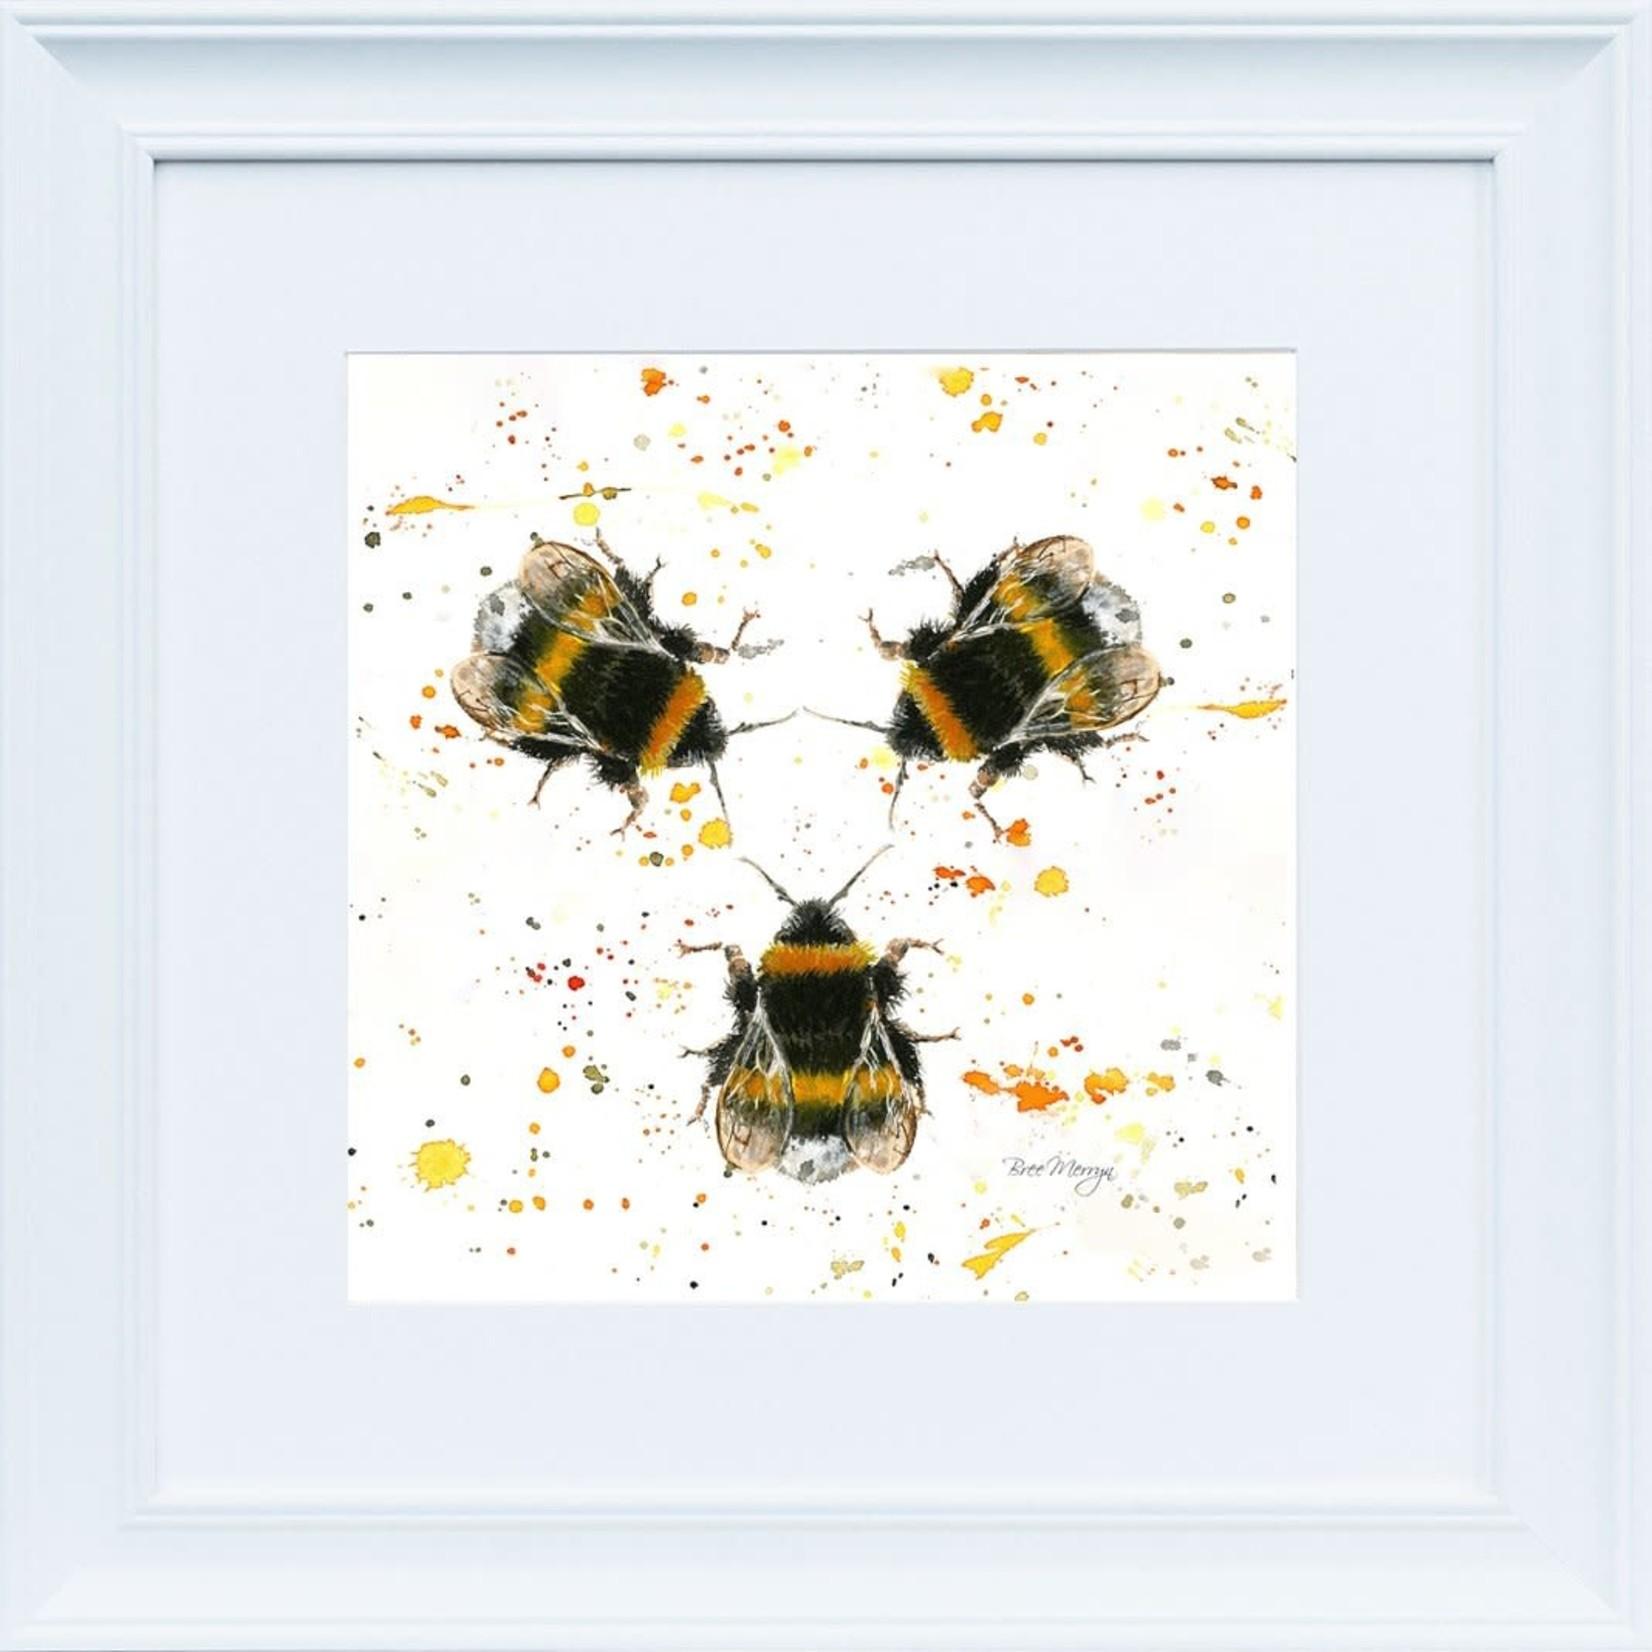 Bree Merryn Three Bees White Frame 48cm